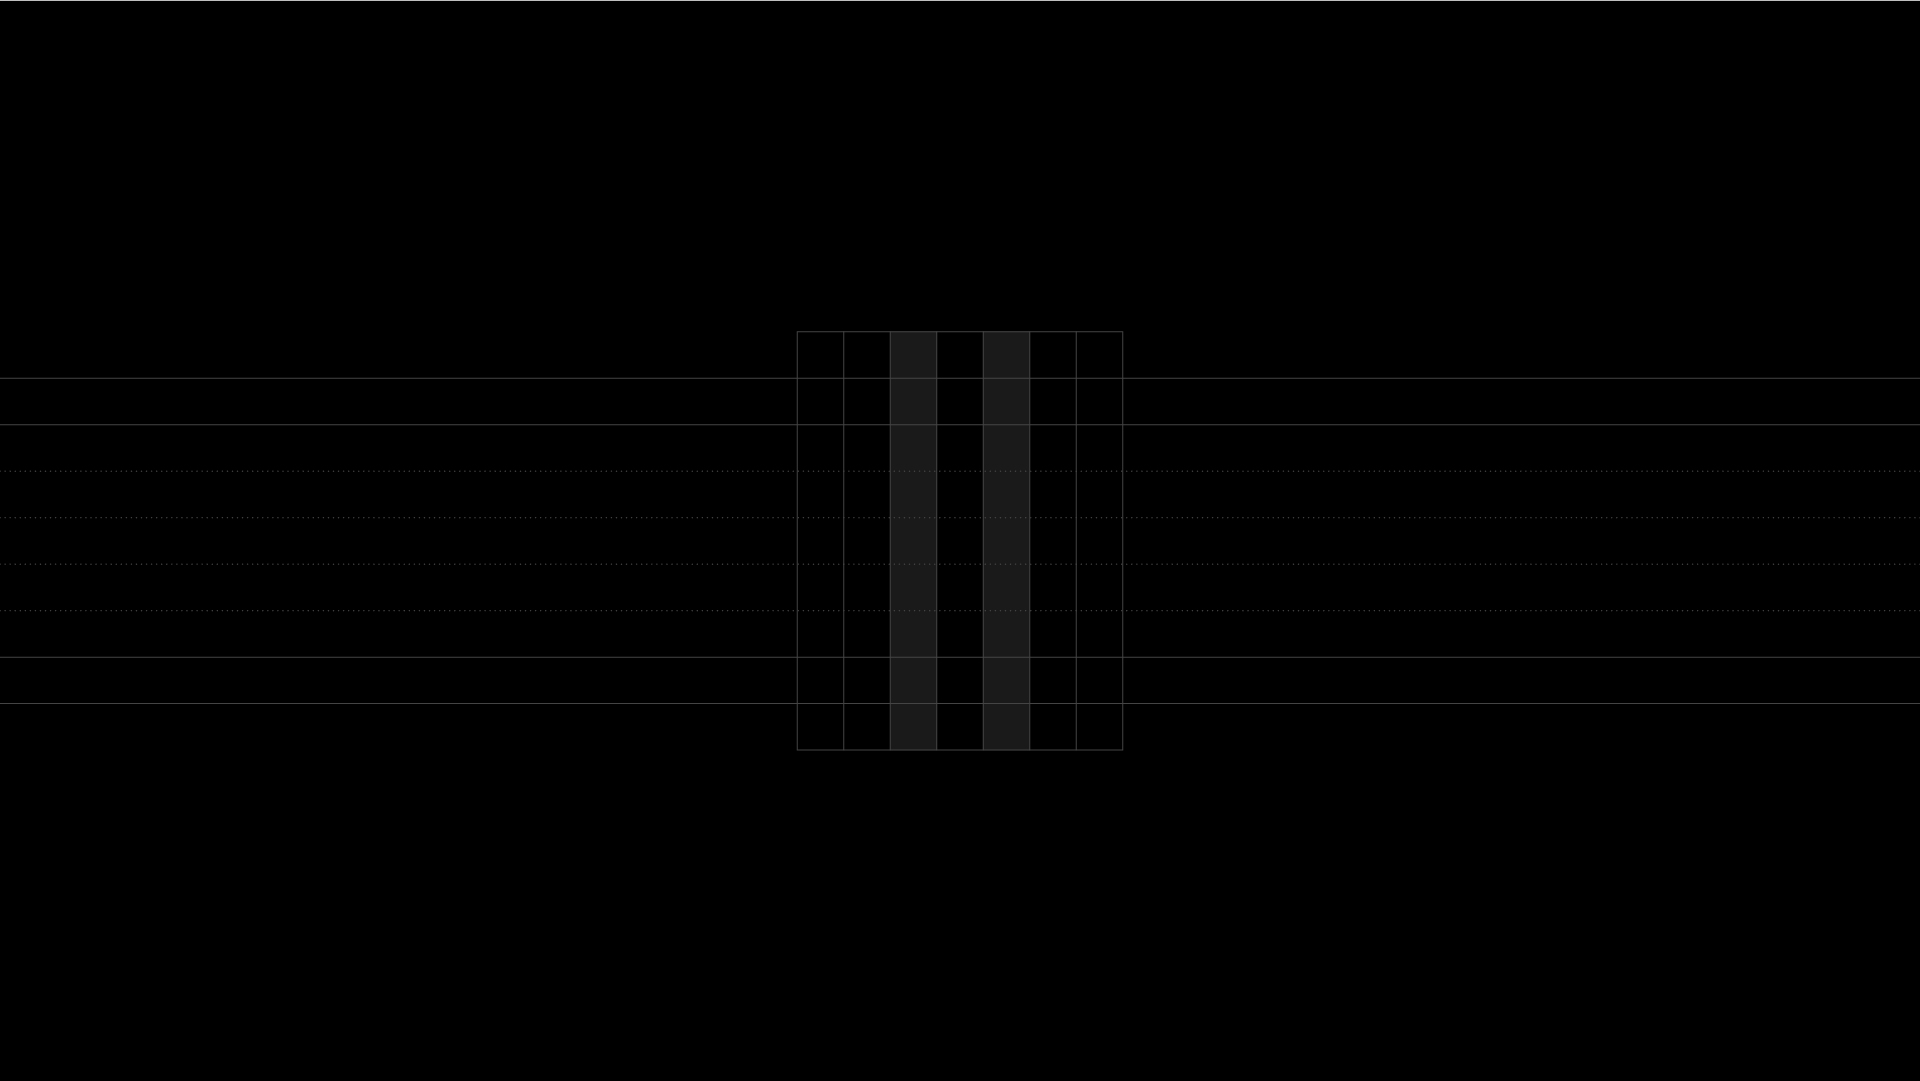 MAJID_JORDAN_logo_rviz_2.jpg